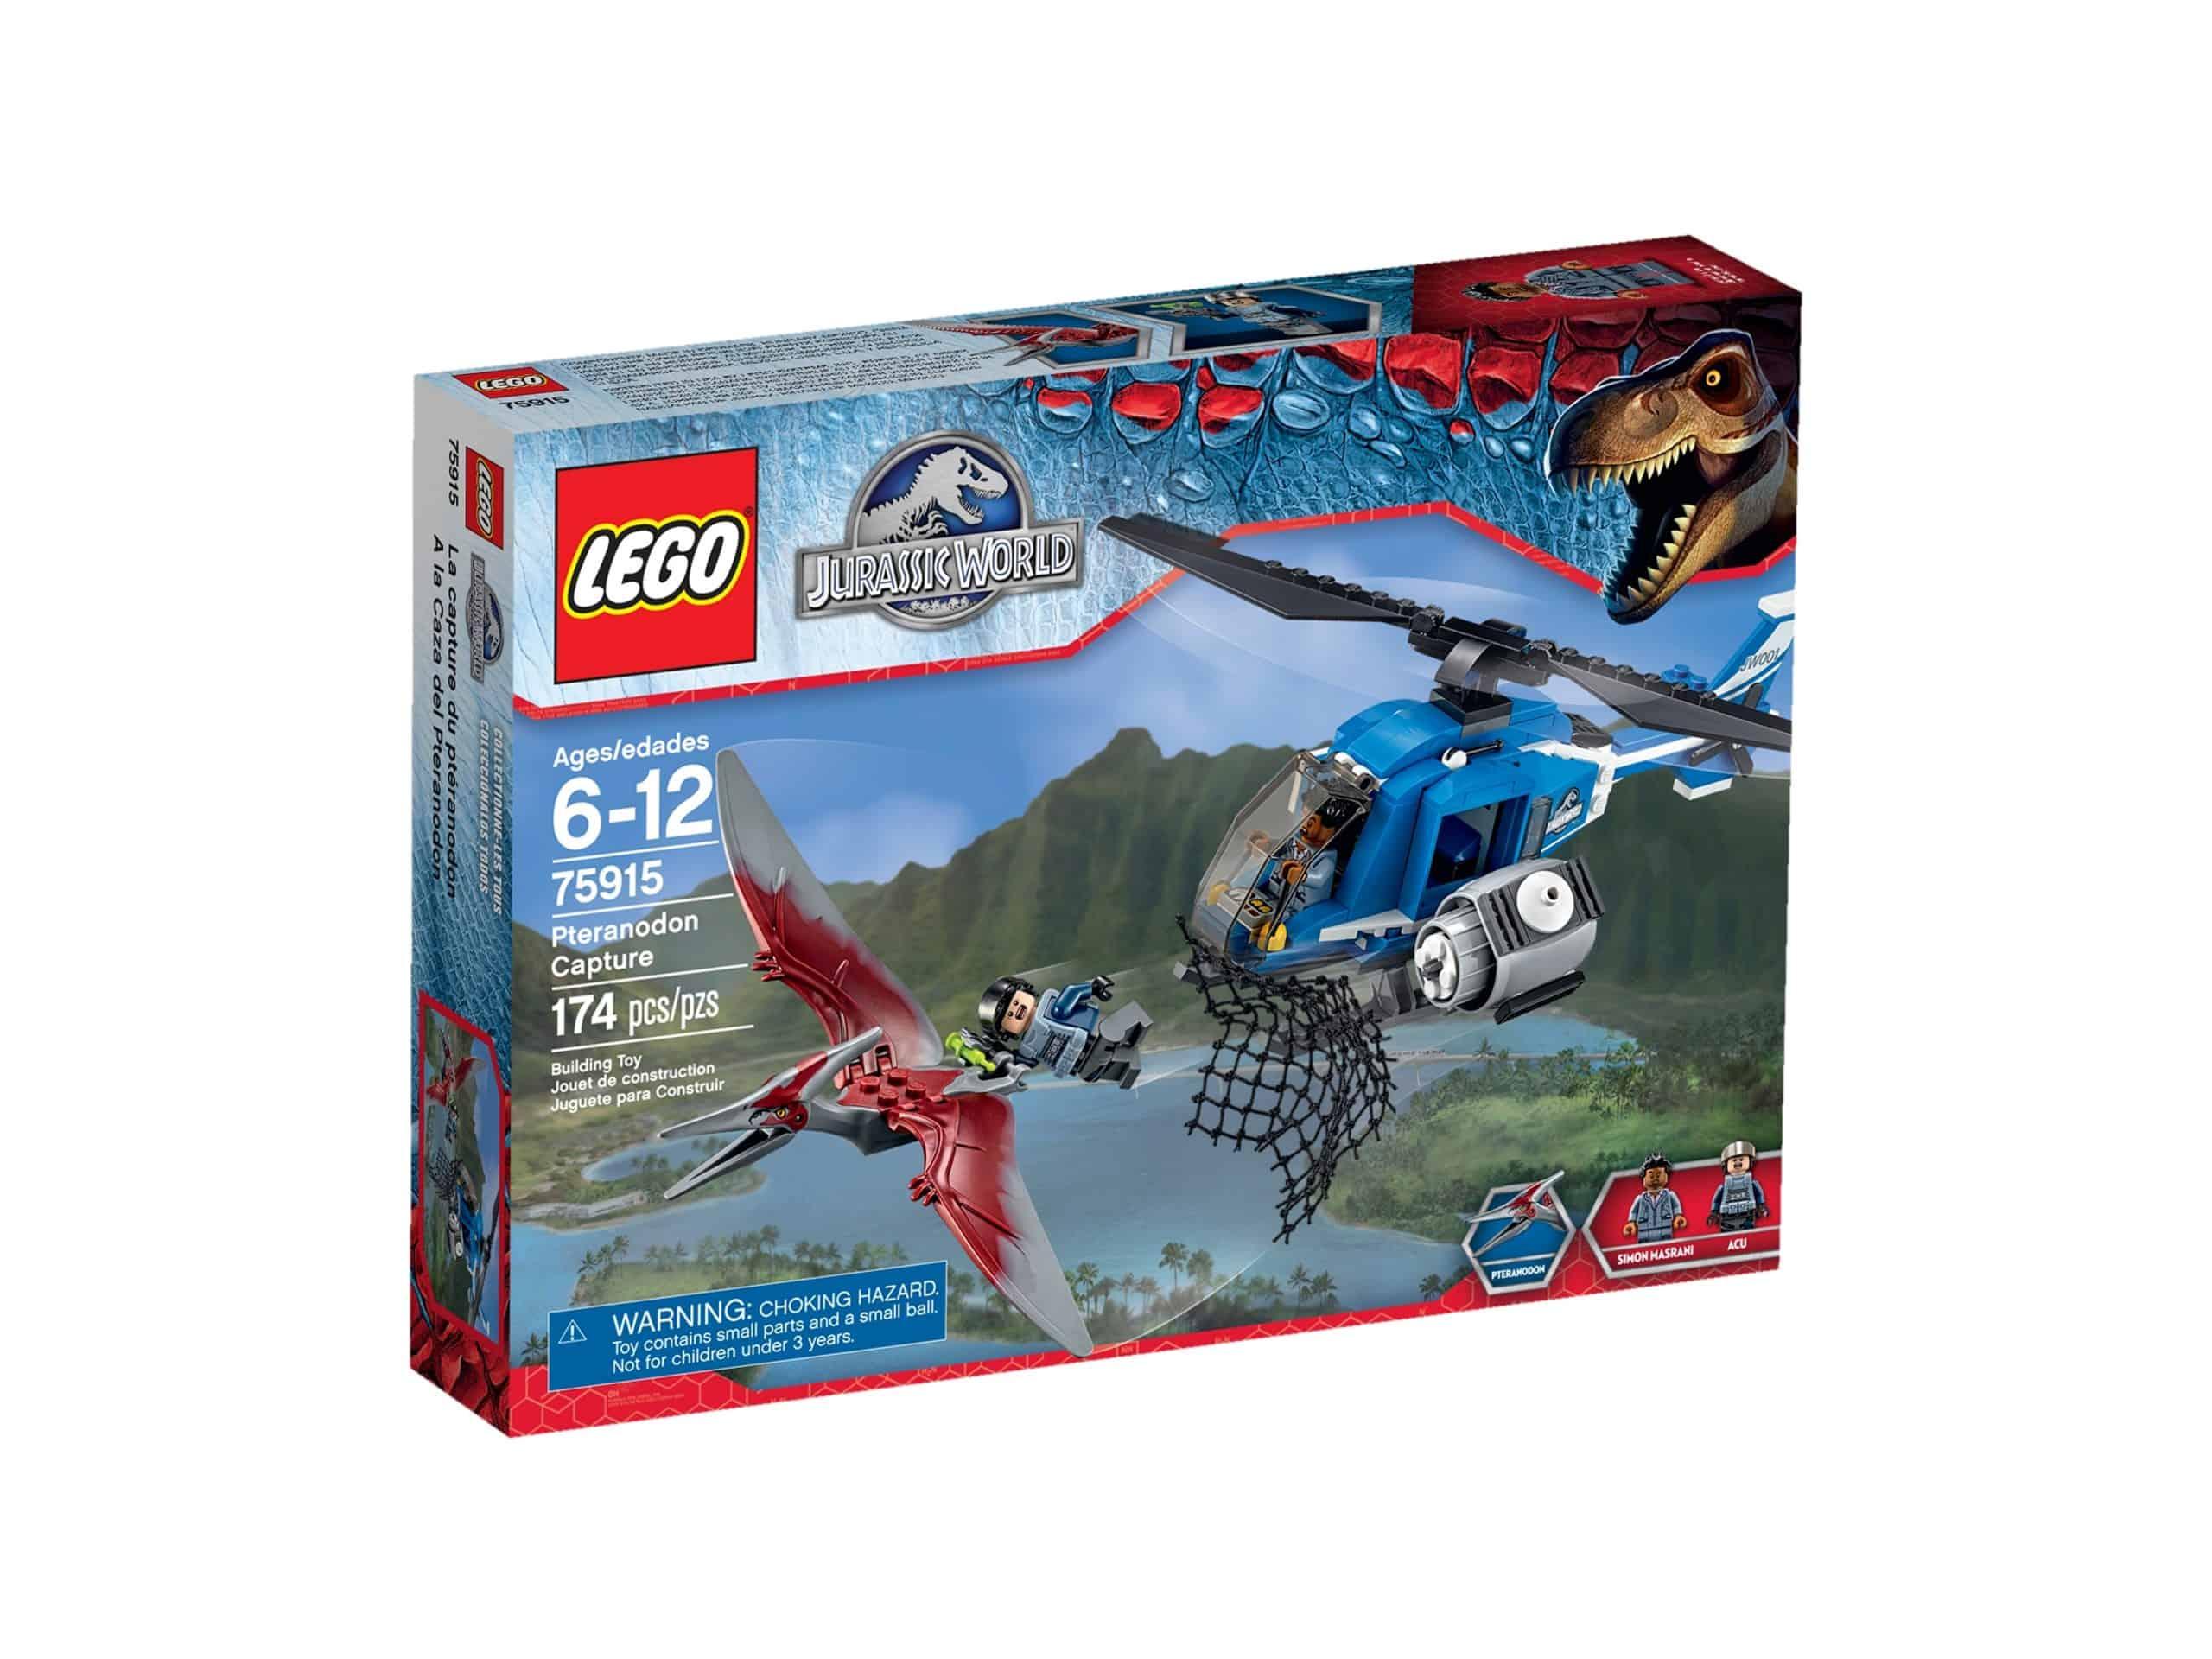 lego 75915 jagd auf pteranodon scaled